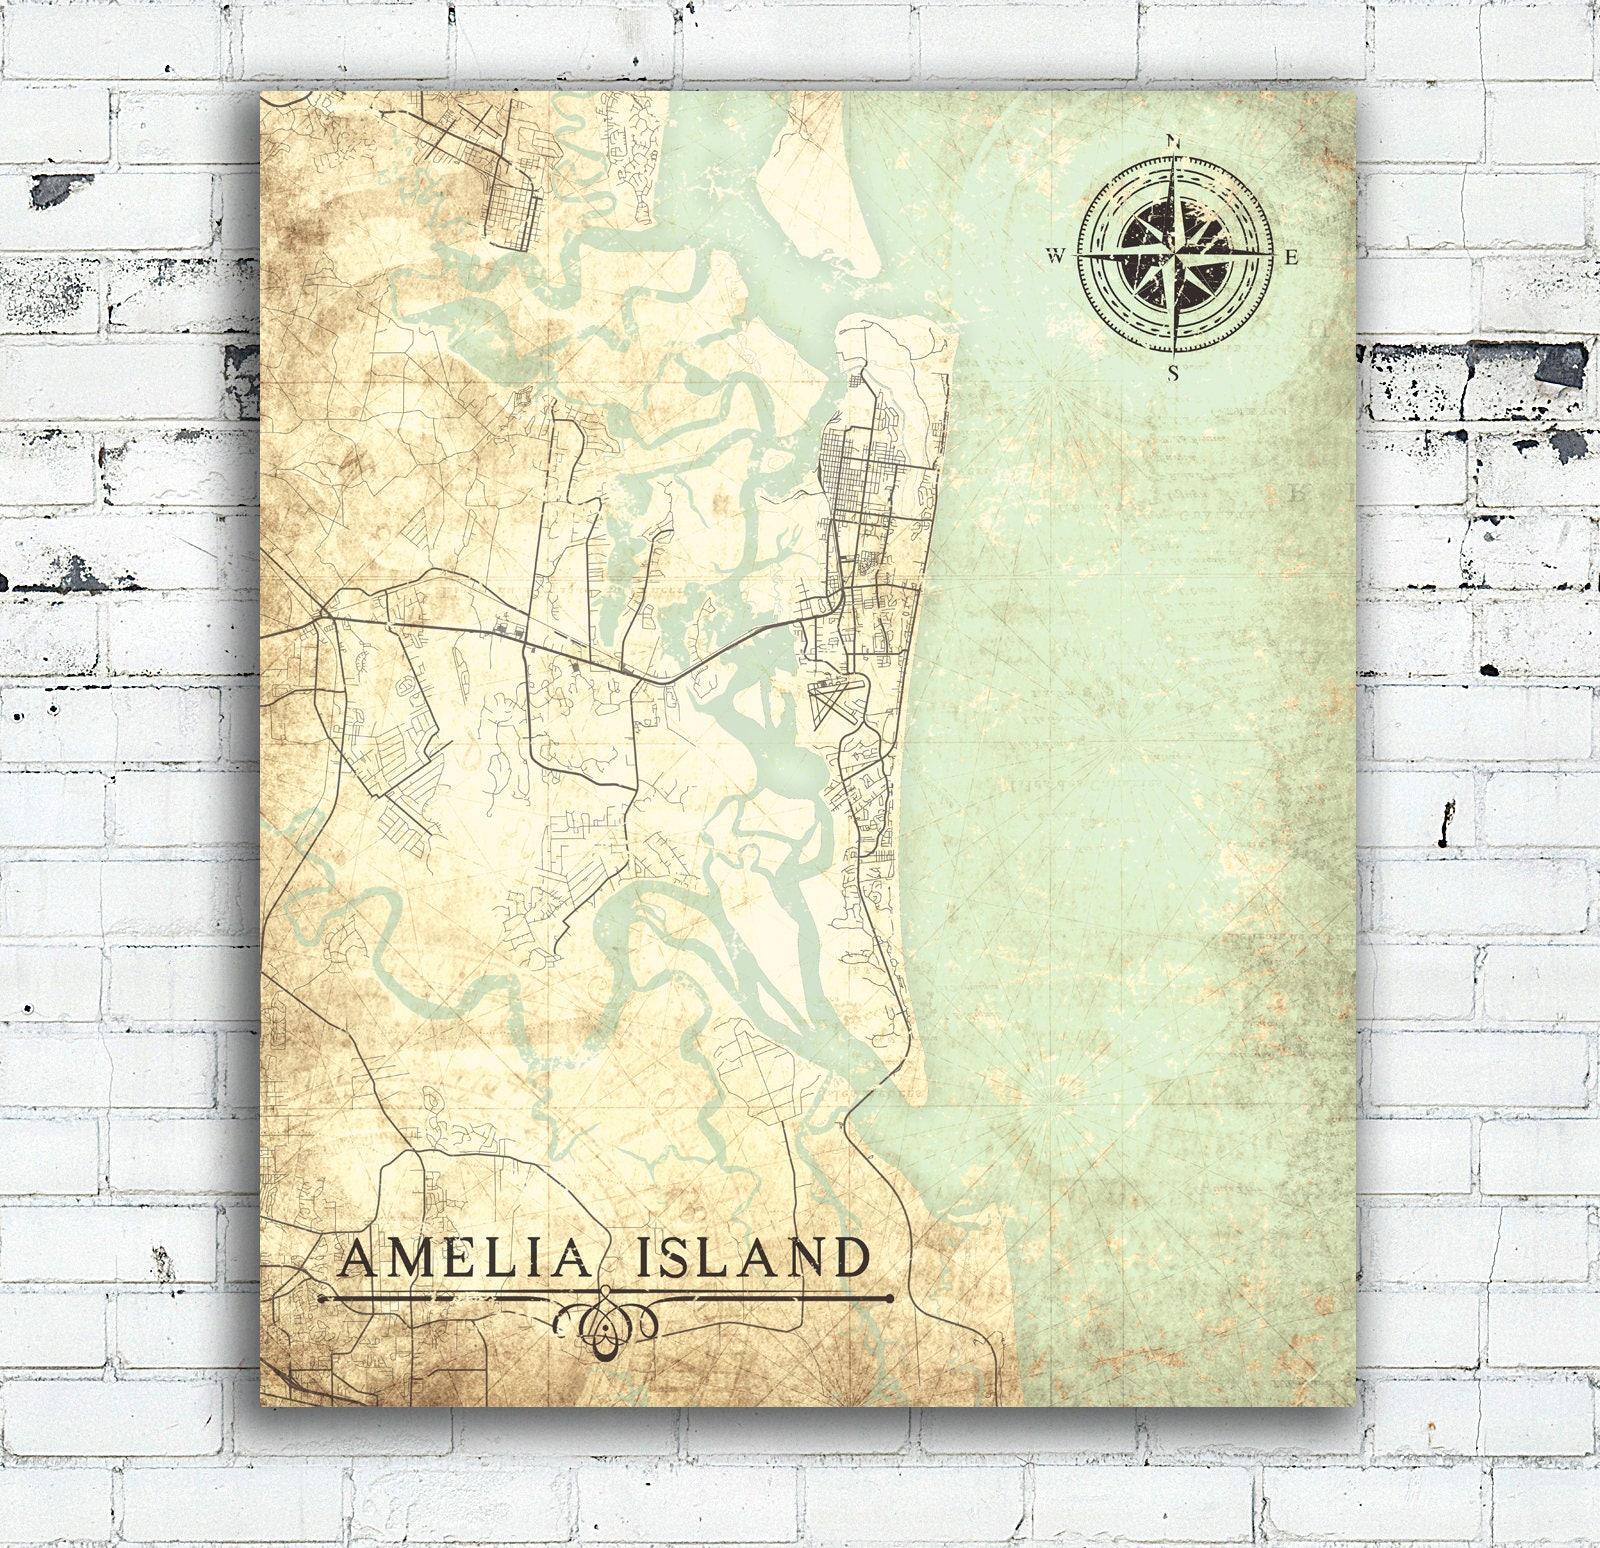 AMELIA ISLAND FL Canvas Print Florida Fl Vintage map City ... on map of gasparilla island florida, map of merritt island florida, map of ponte vedra beach florida, map of big pine key florida, map of st. george island florida, map of pine island florida, map of orchid island florida, map of florida cities, map of anastasia island florida, map of okaloosa island florida, map of st. augustine florida, map of little torch key florida, map of st. simons island georgia coast, map of royal palm beach florida, map of dog island florida, map of captiva island florida, map of cayo costa florida, map of hutchinson island florida, map of anna maria island florida, large map of florida,